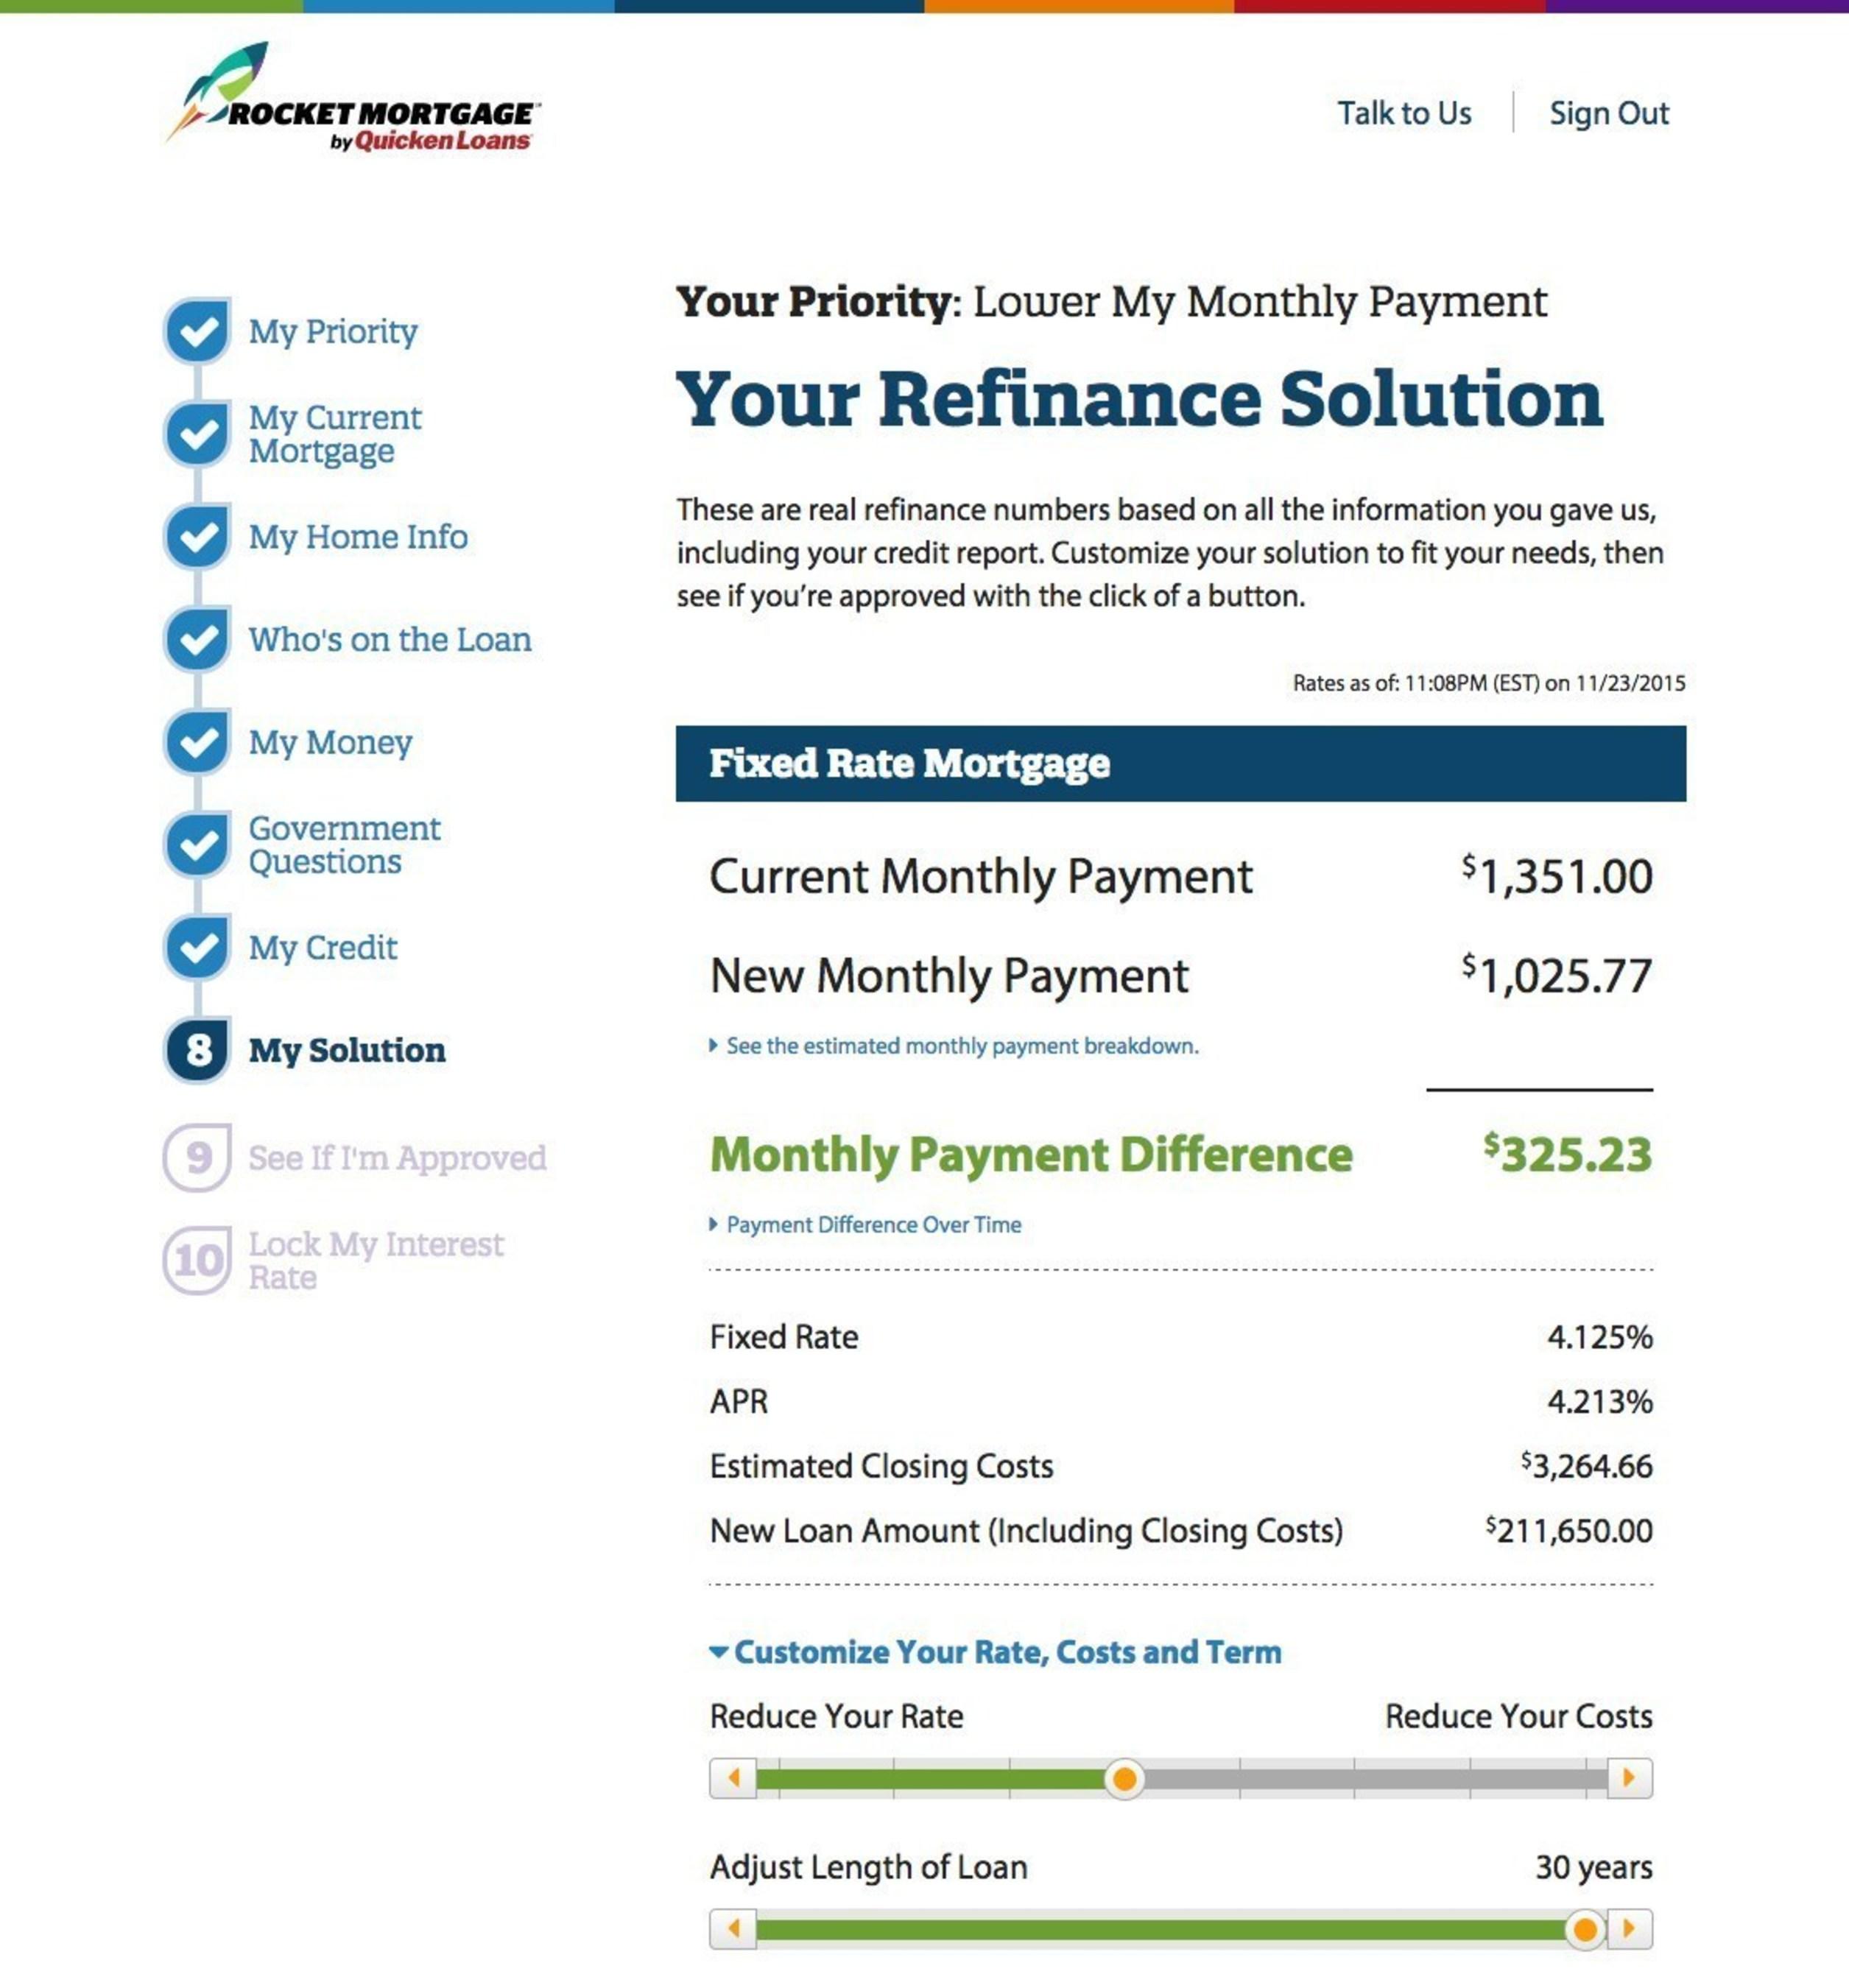 Customizable refinance solution - Rocket Mortgage